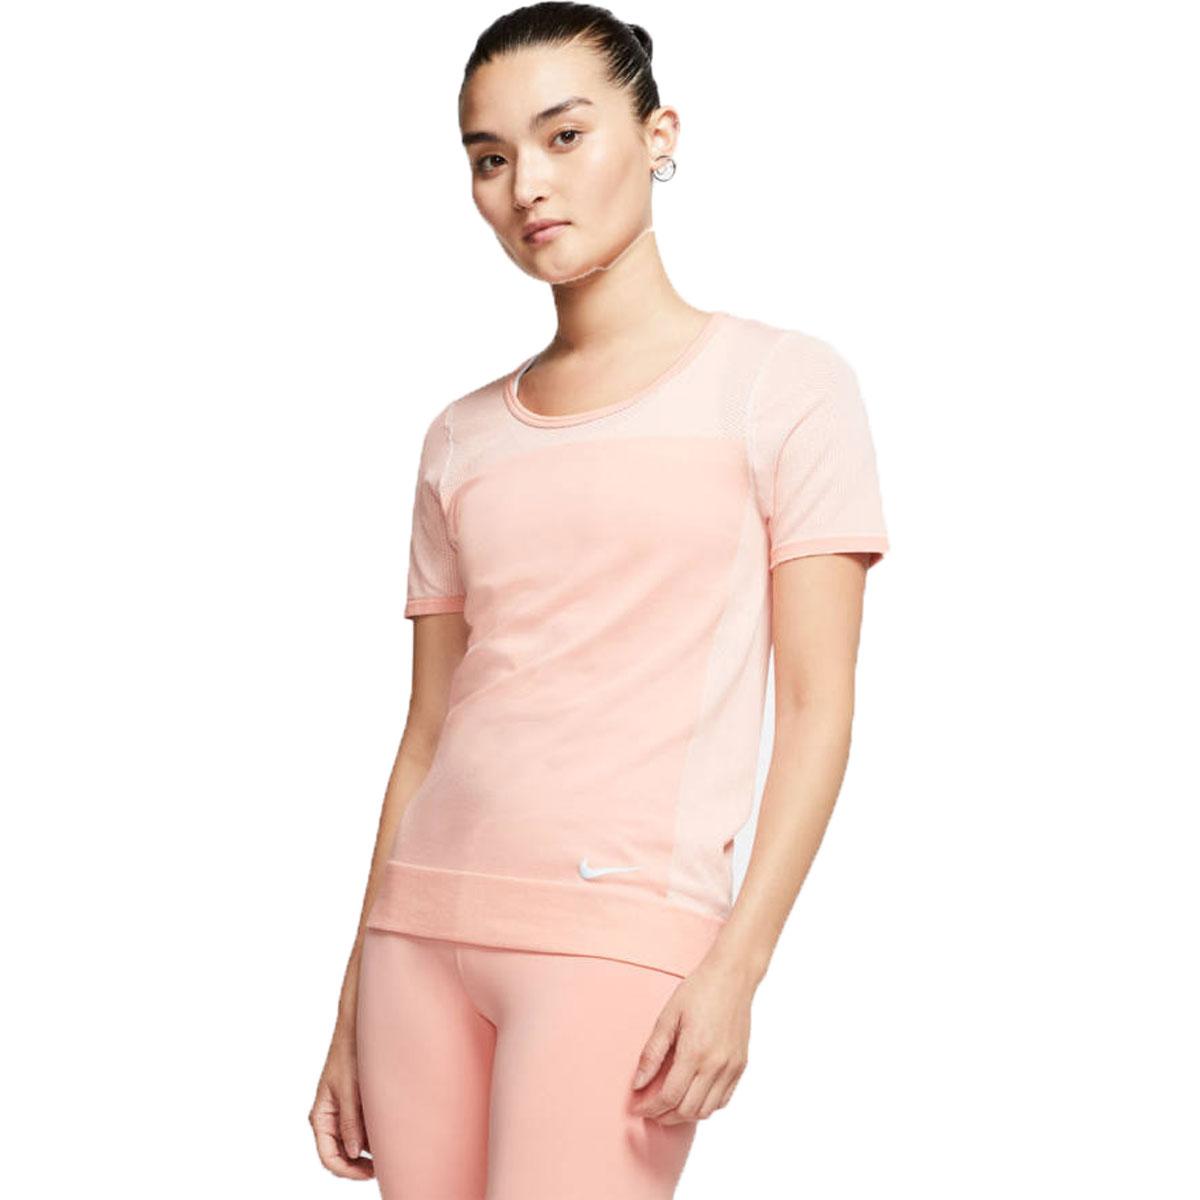 Women's Nike Infinite Short Sleeve, , large, image 1